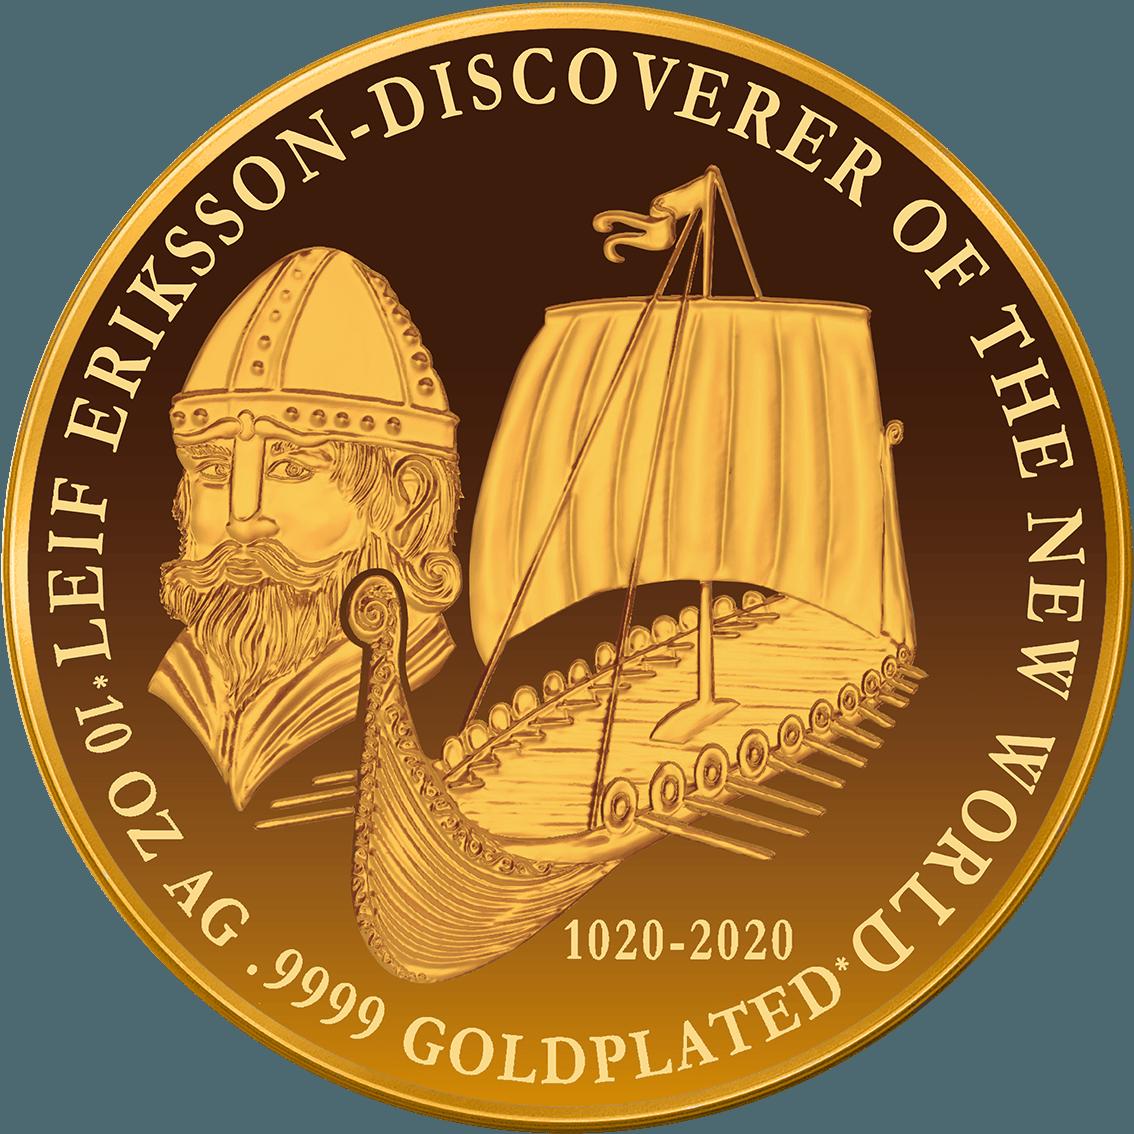 Leif-Eriksson_10 OZ AG 9999 Goldplate 65 mm